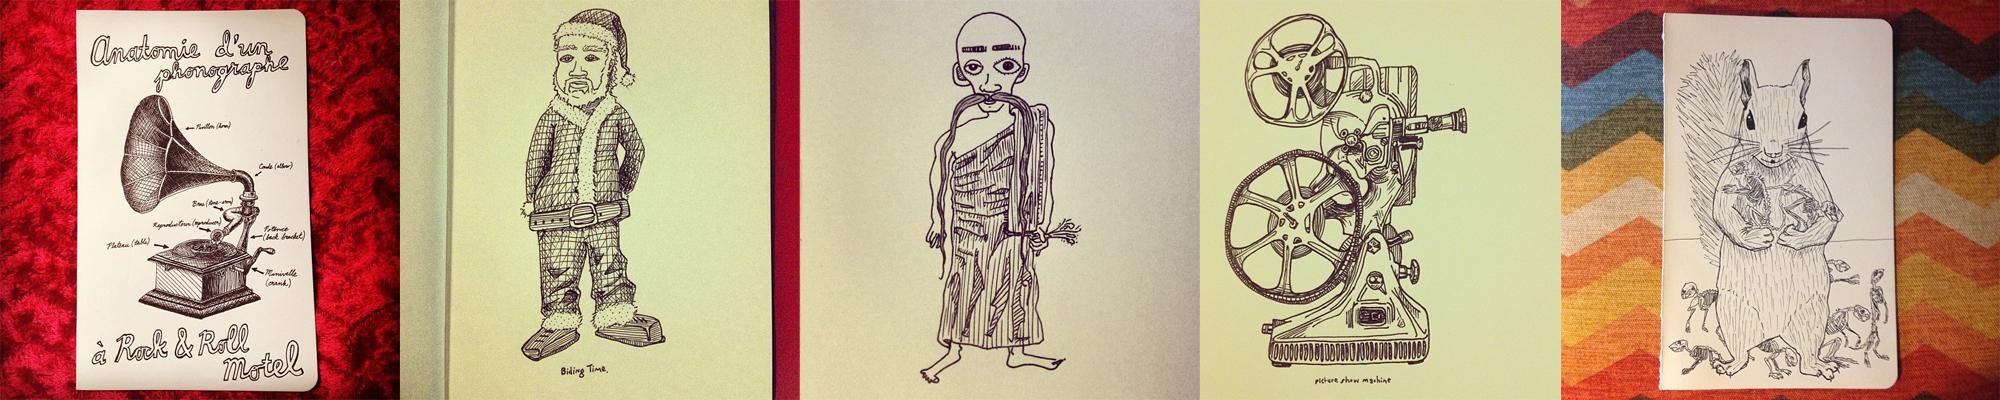 GIFTAWAY-2013-Drawings